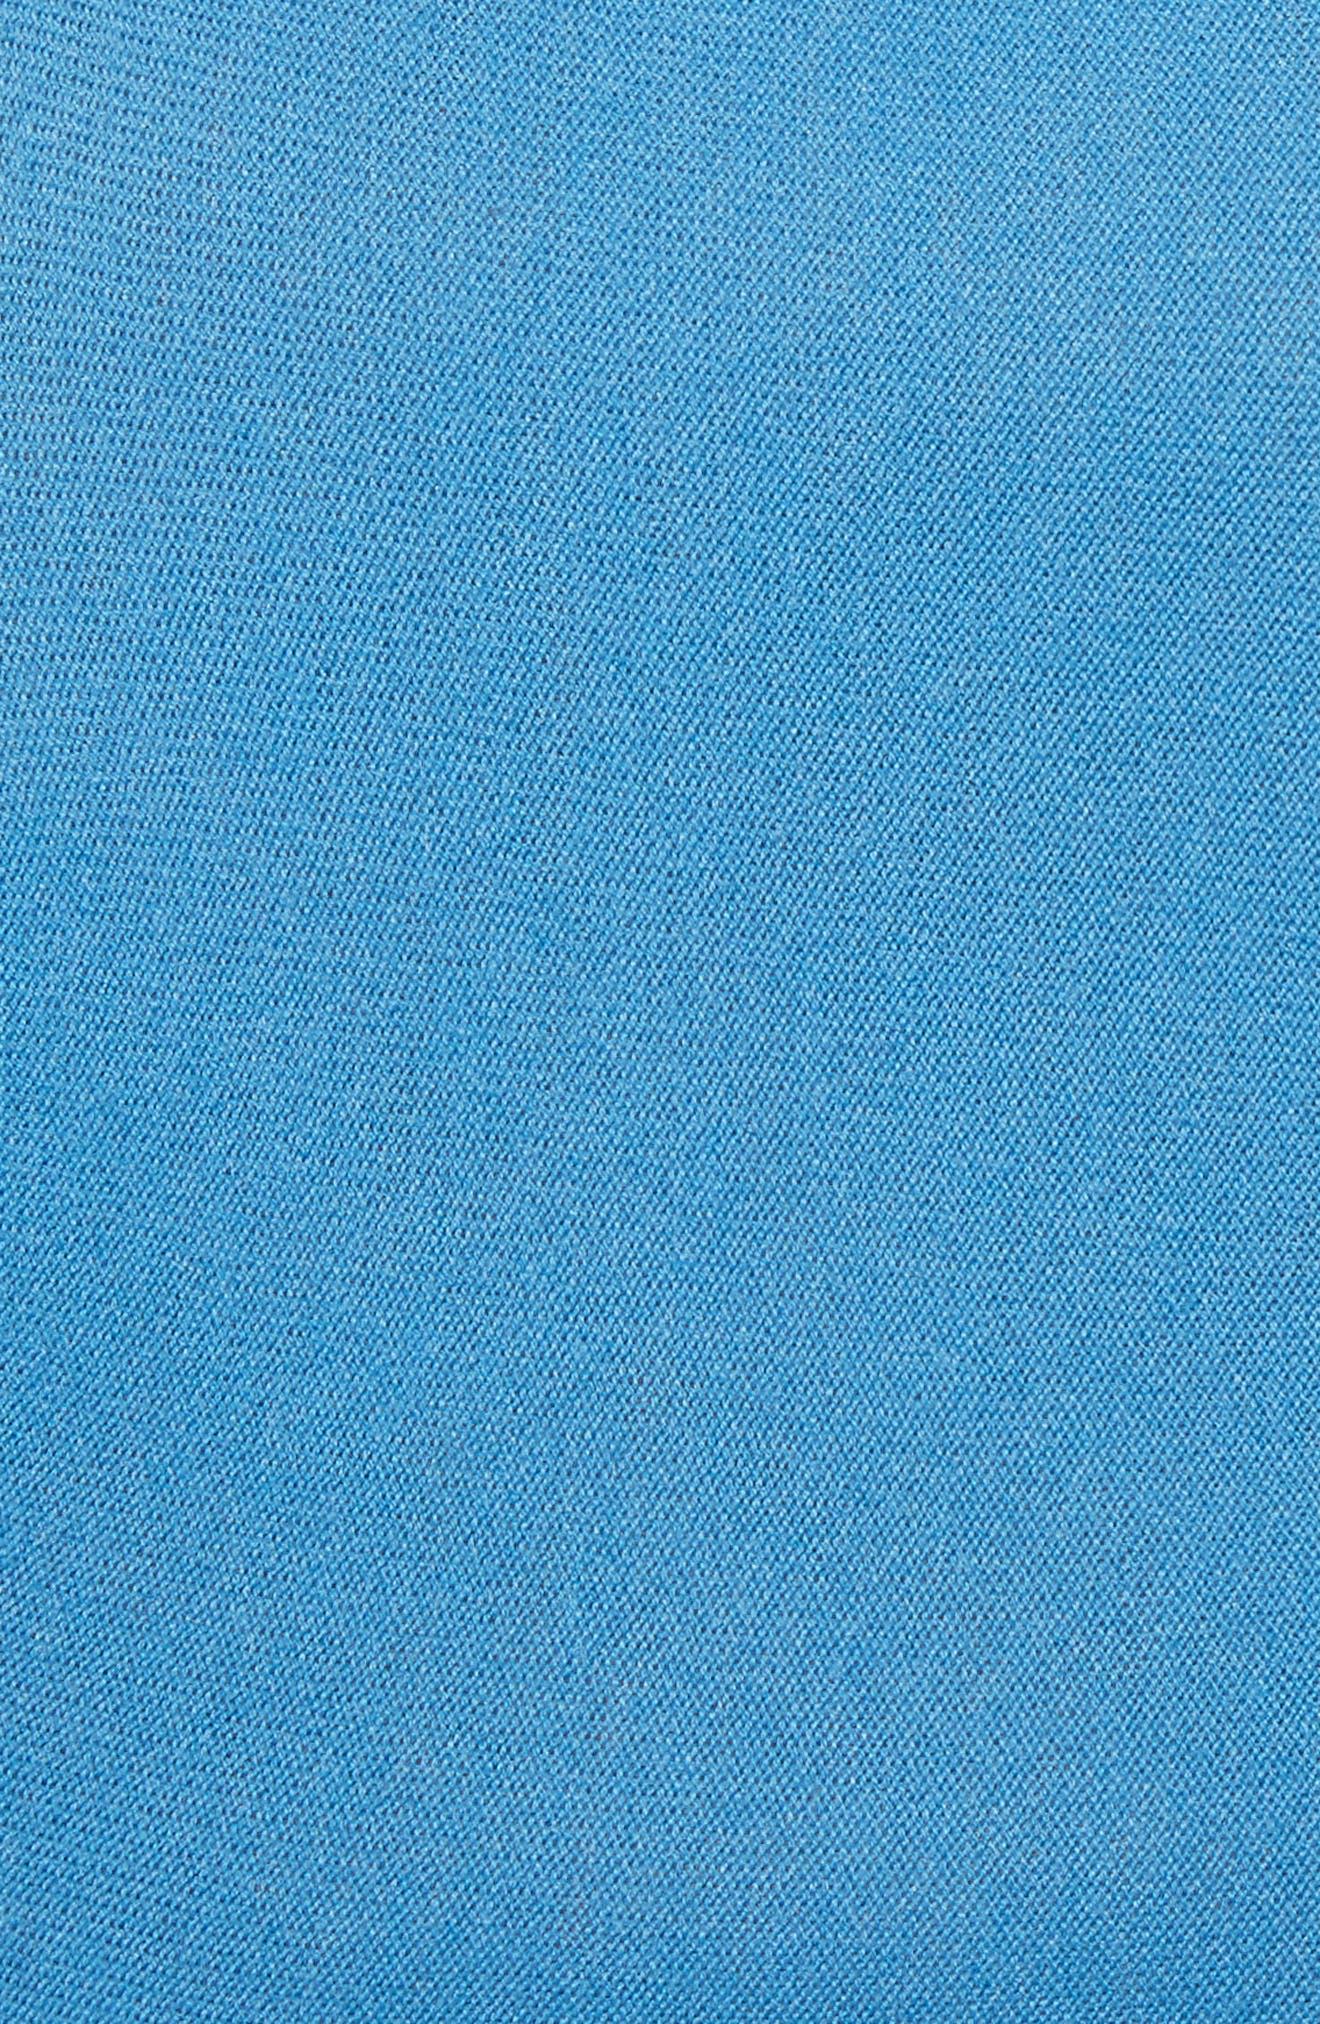 Flounced Turtleneck Sweater,                             Alternate thumbnail 5, color,                             487